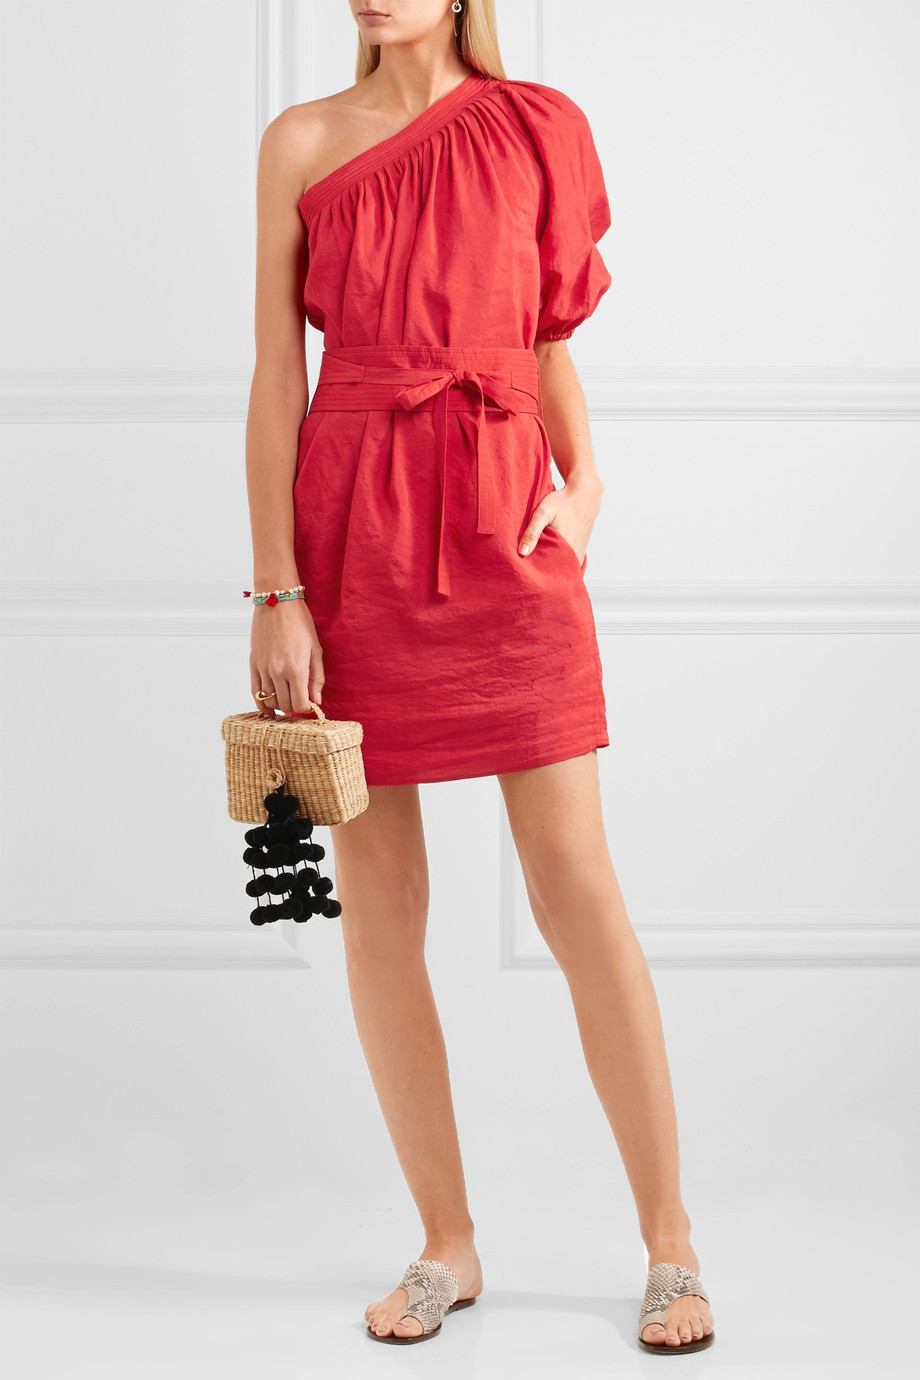 Vanessa Bruno Grace one-shoulder voile mini dress now $424